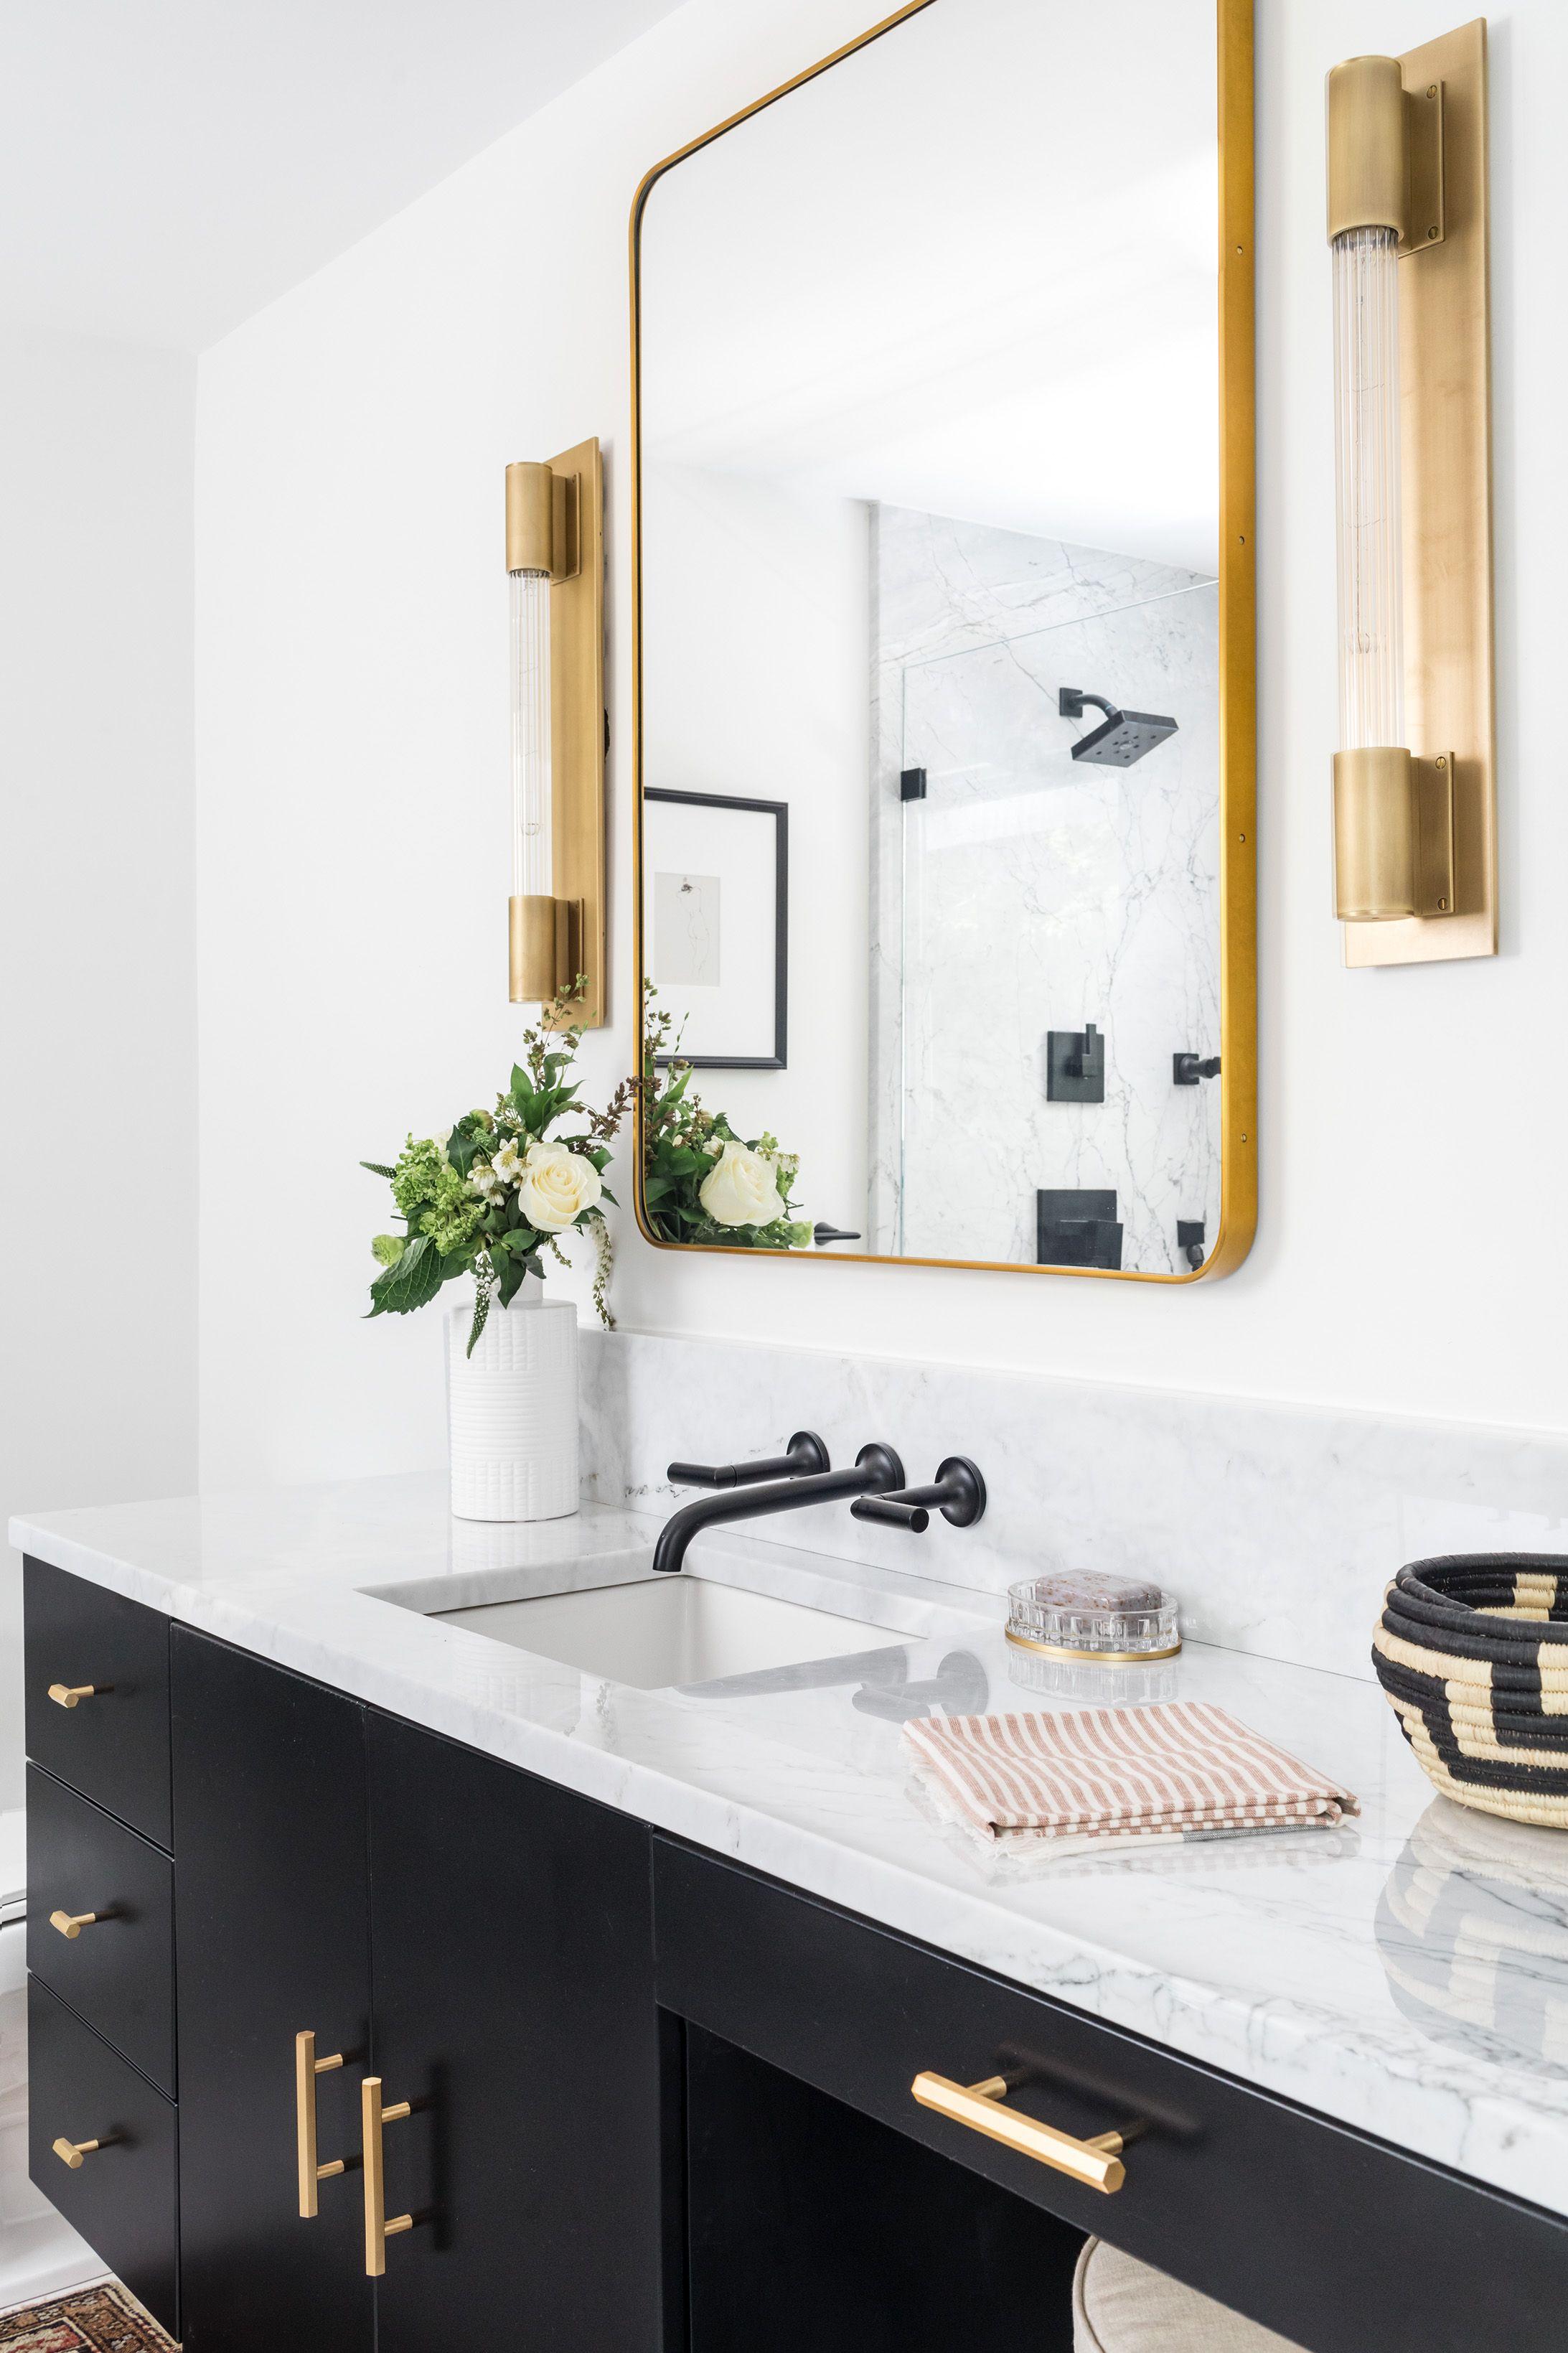 Modern Bathroom Black Vanity Brass Accents Top Bathroom Design Black Bathroom Bathroom Design Small